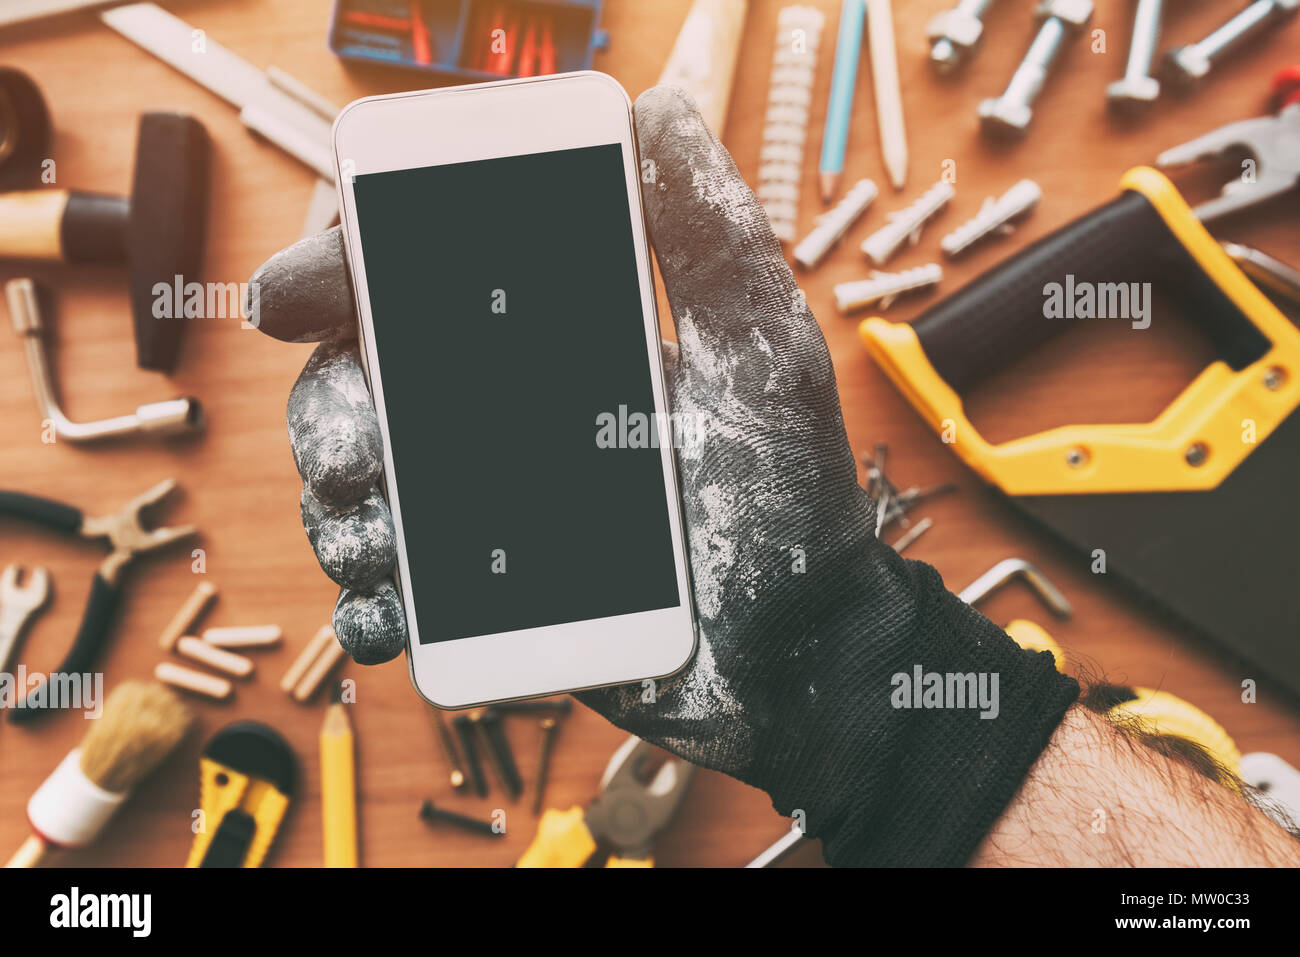 Smart phone app for handyman, repairman holding mobile phone